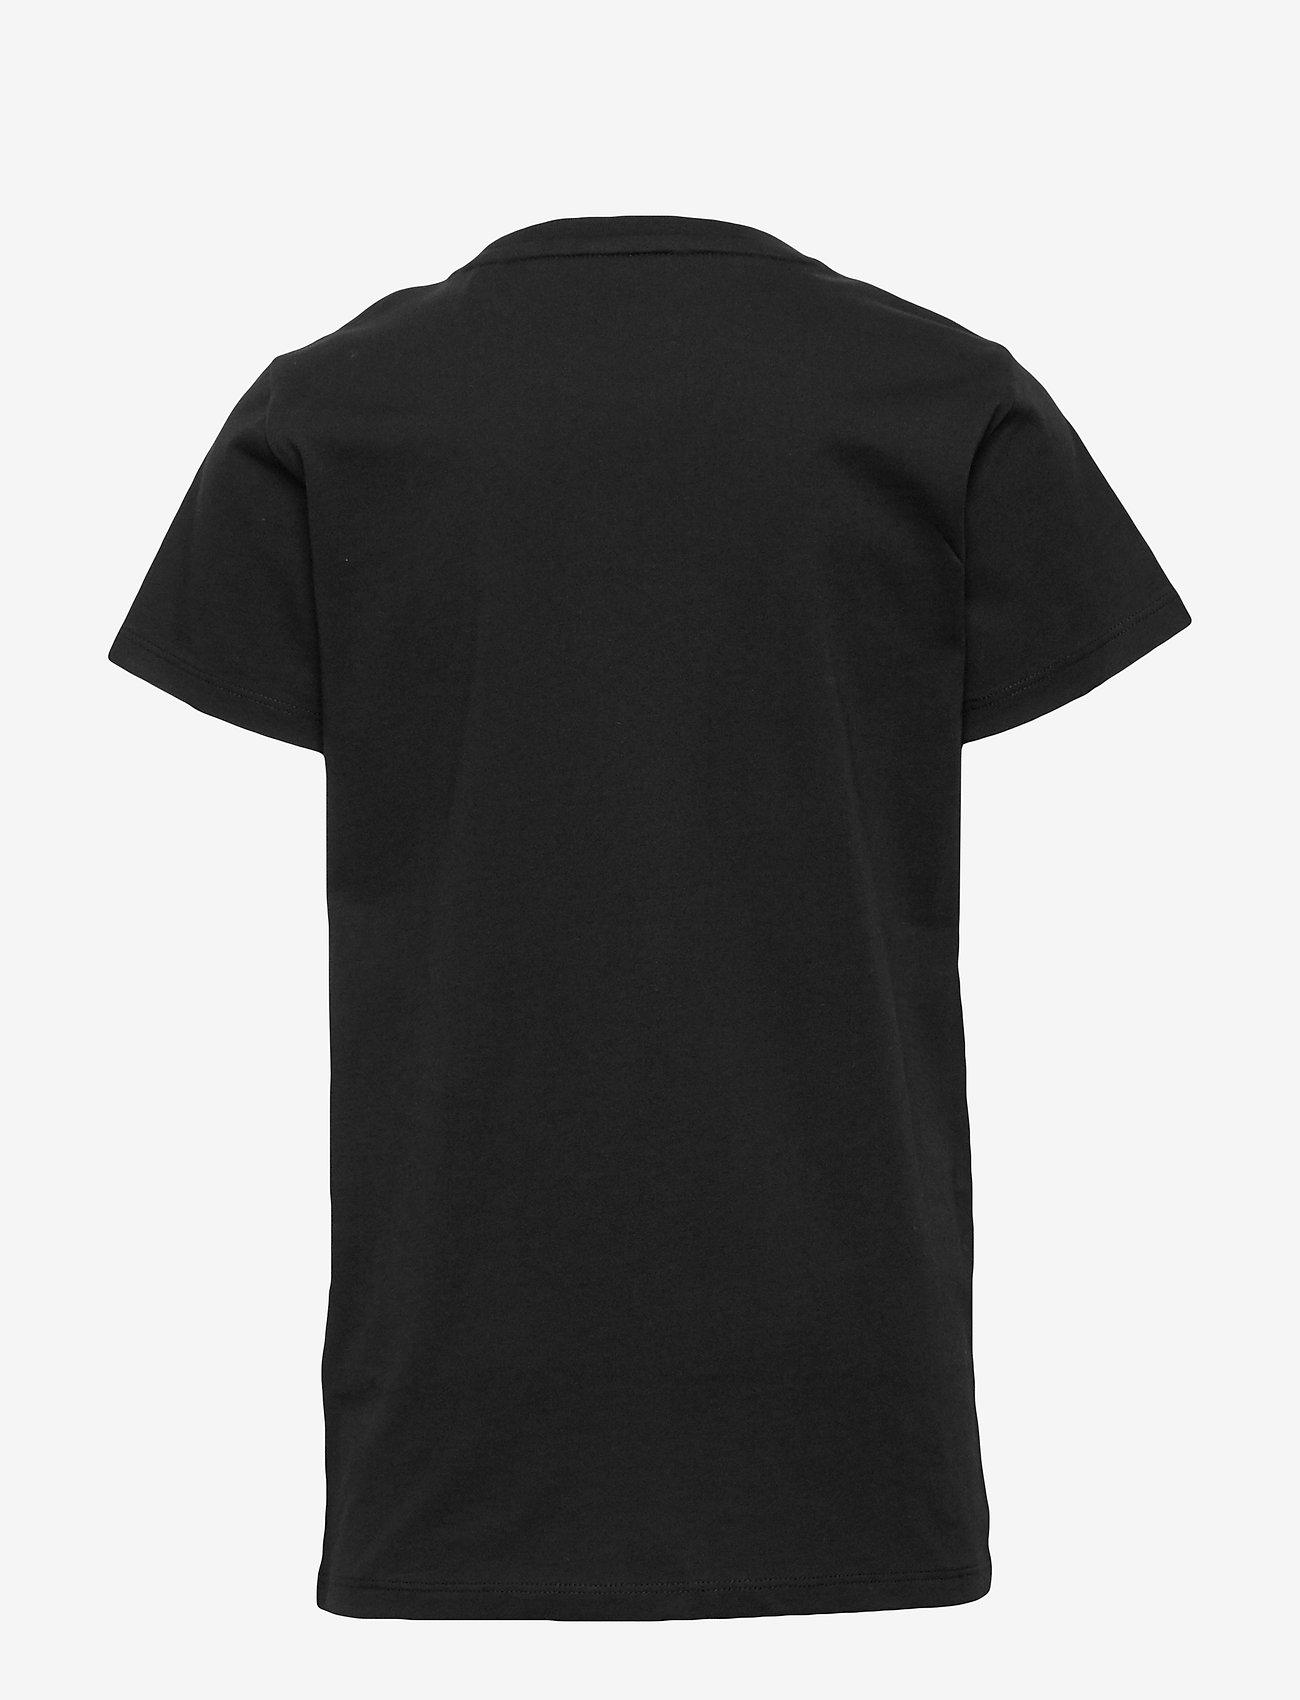 Gant - GANT LOCK-UP SS T-SHIRT - short-sleeved - black